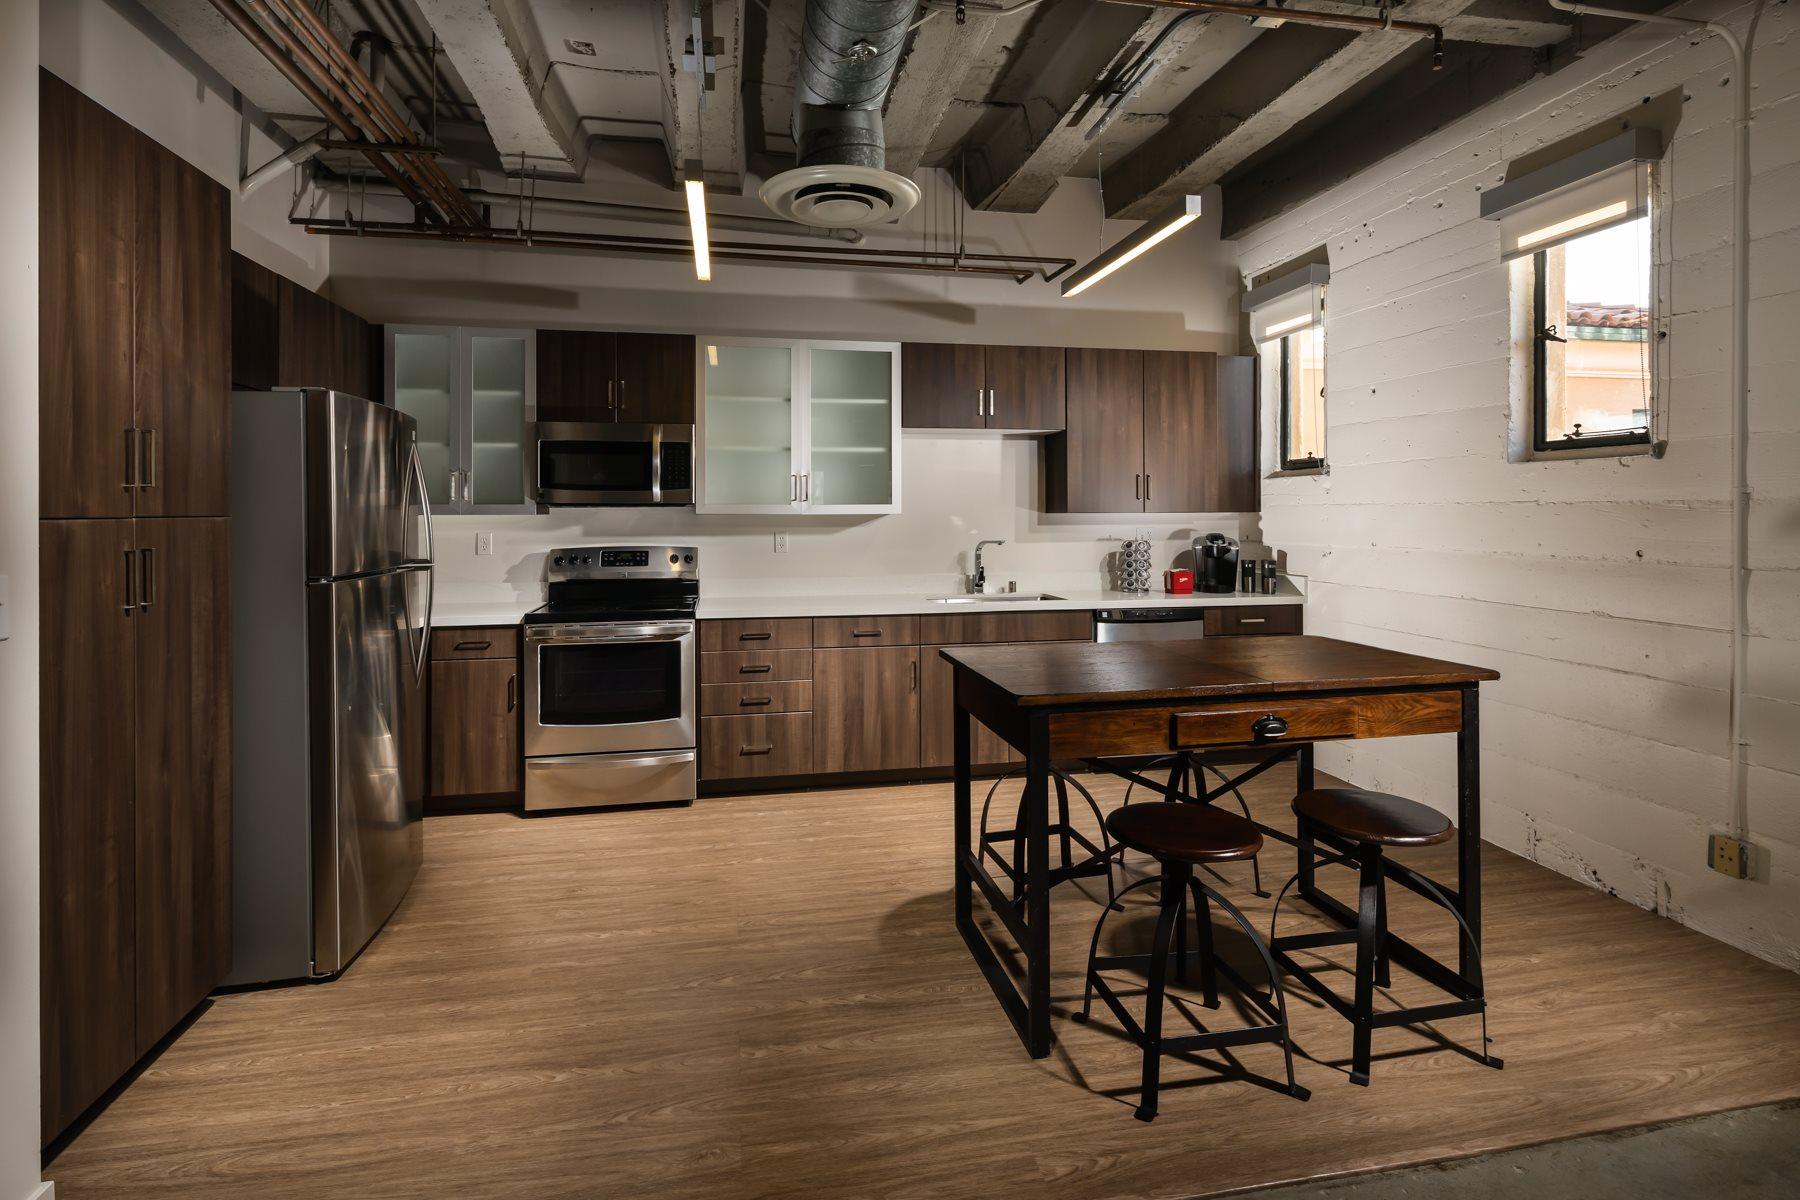 Kitchen-unit-interior